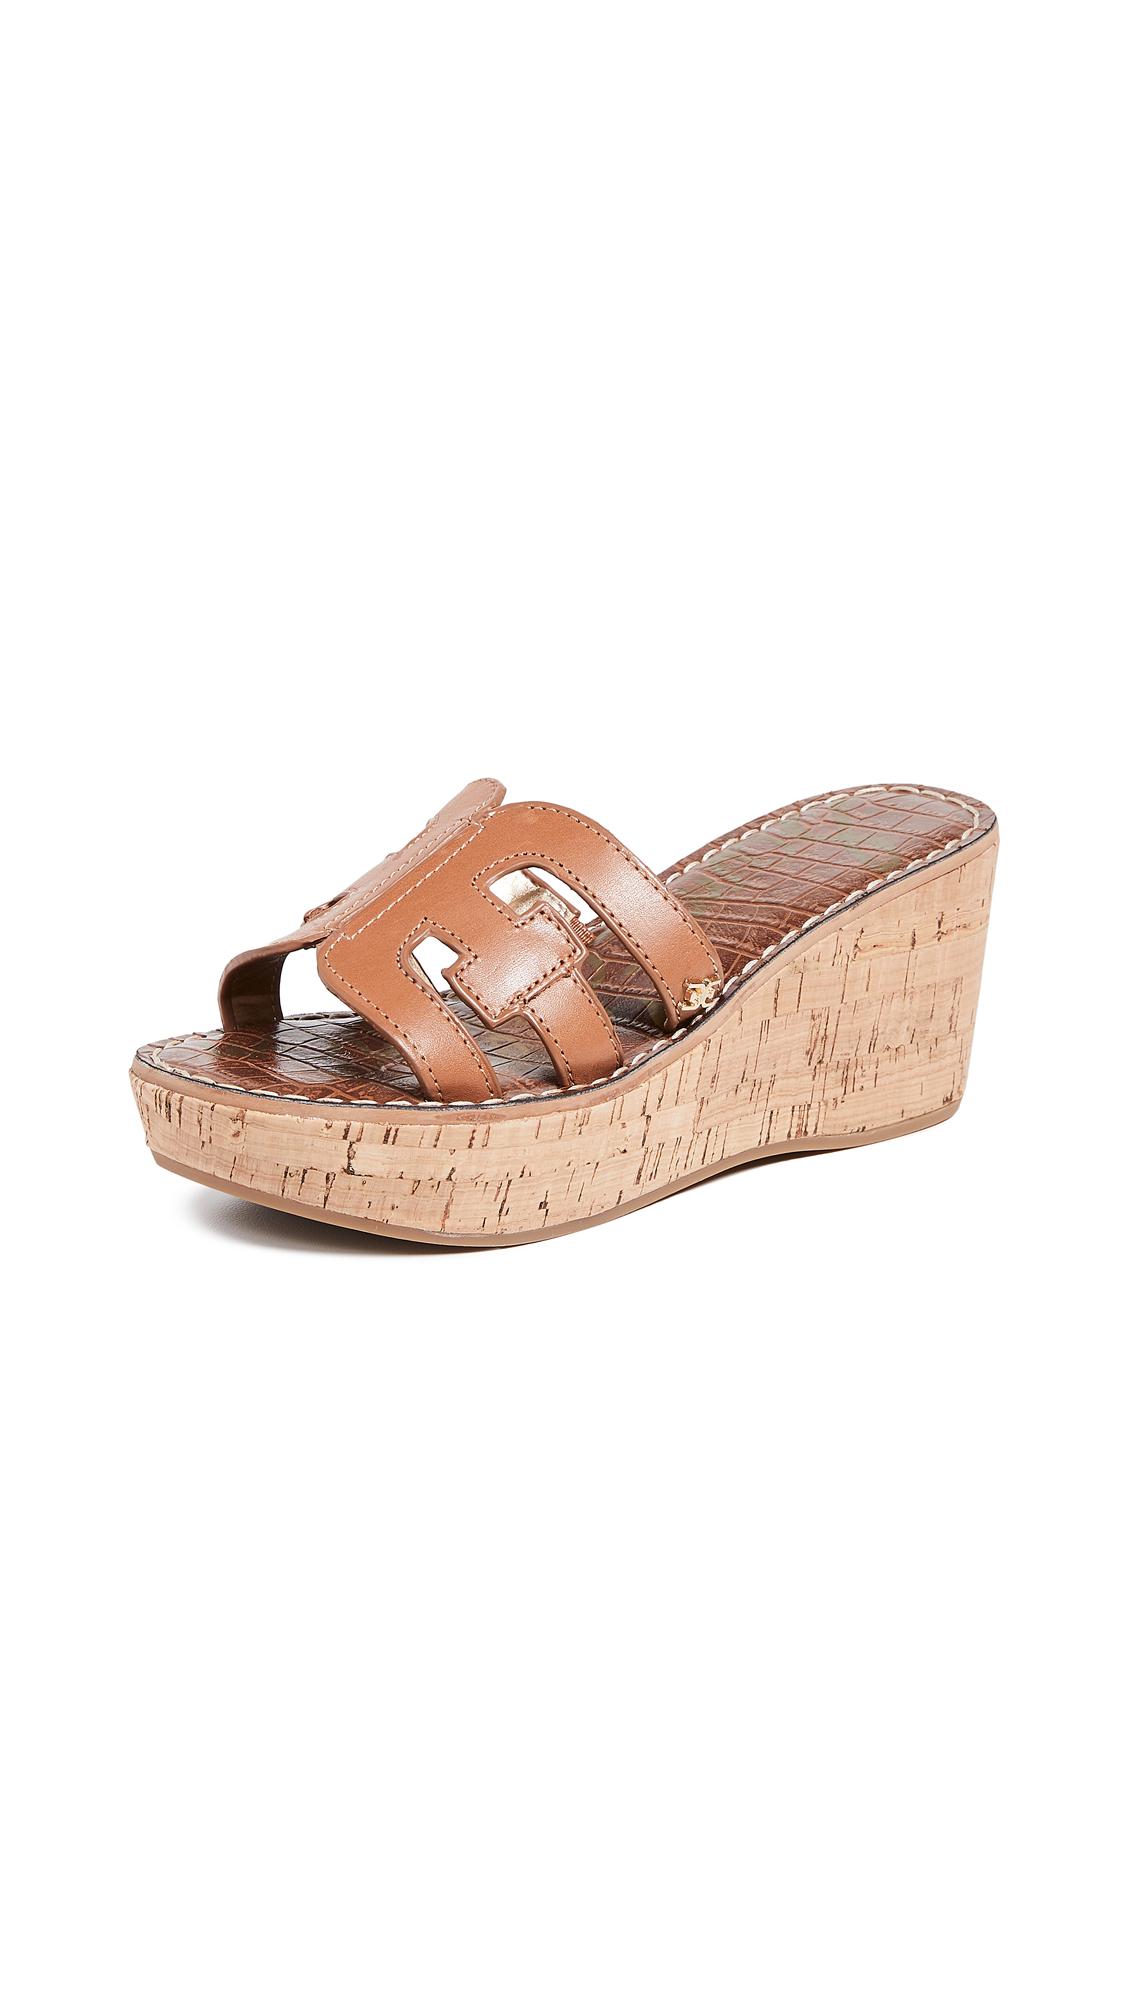 Sam Edelman Regis Slide Sandals